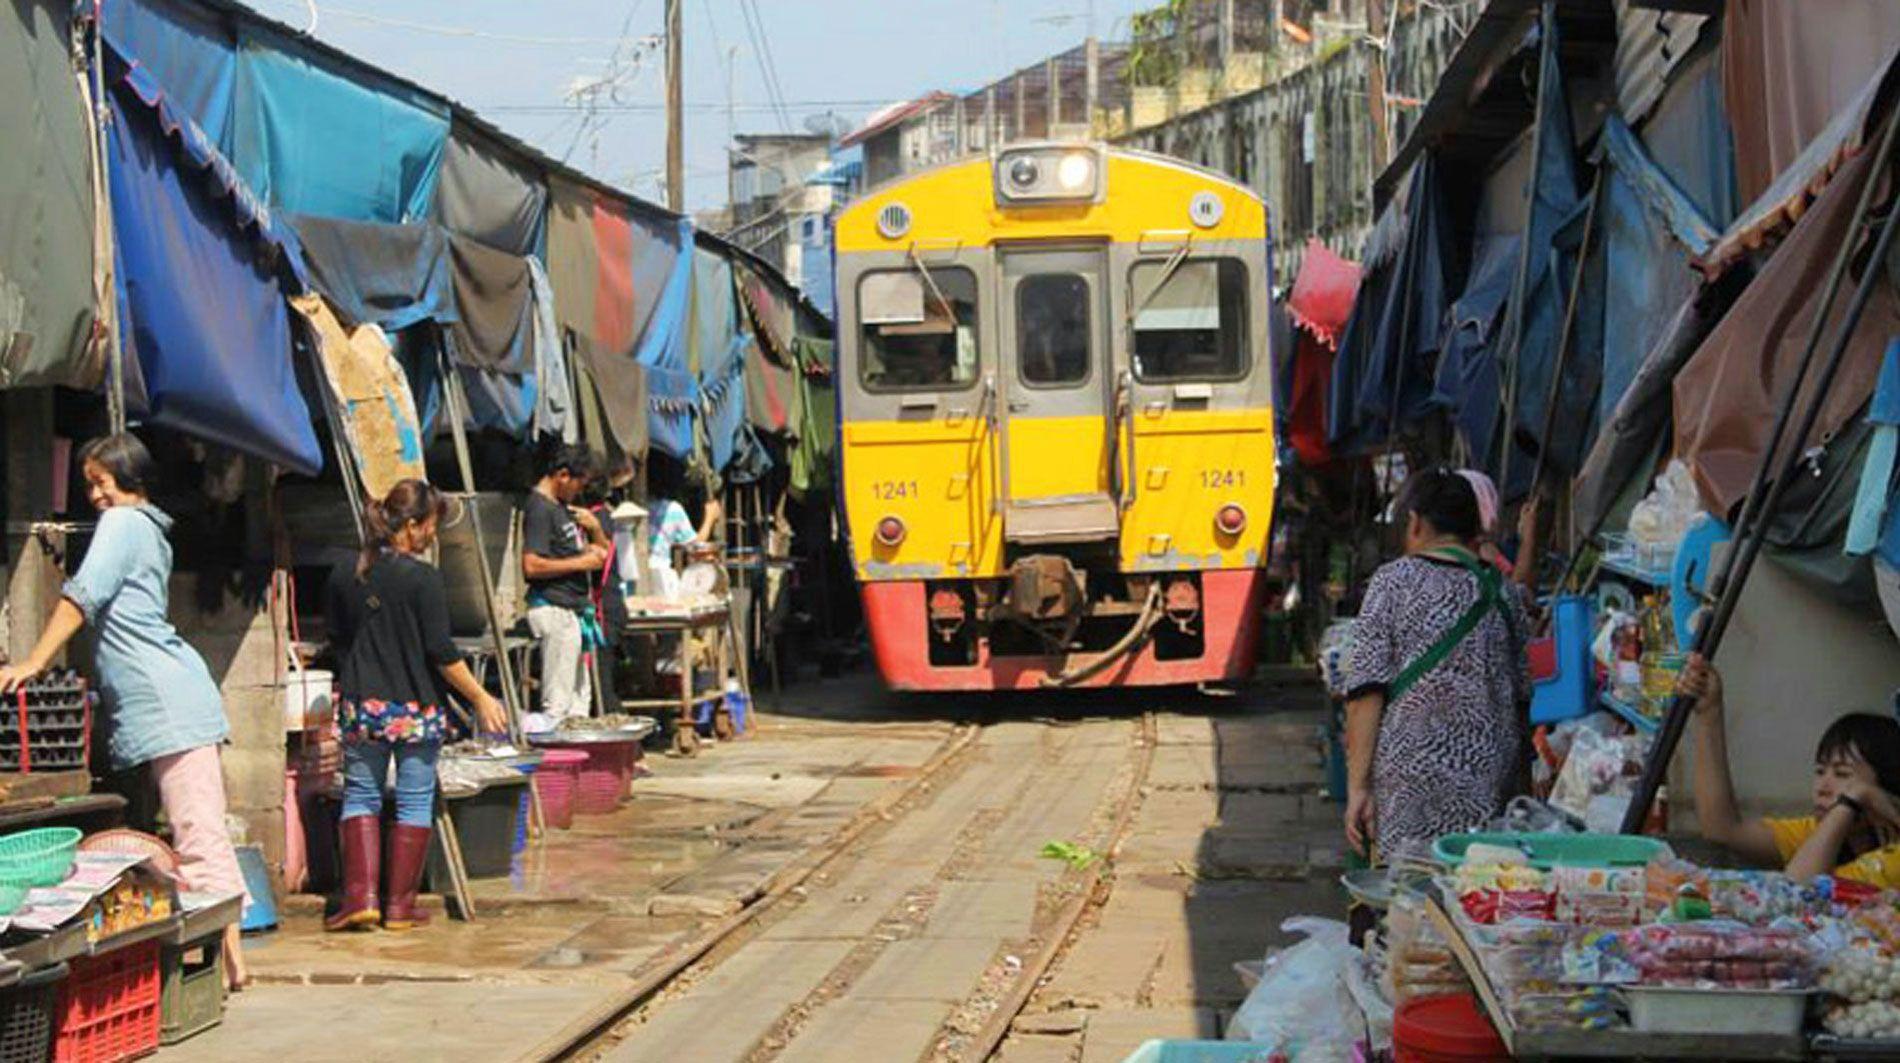 Mahachai Train Spotting Beyond Bangkok (Full Day)